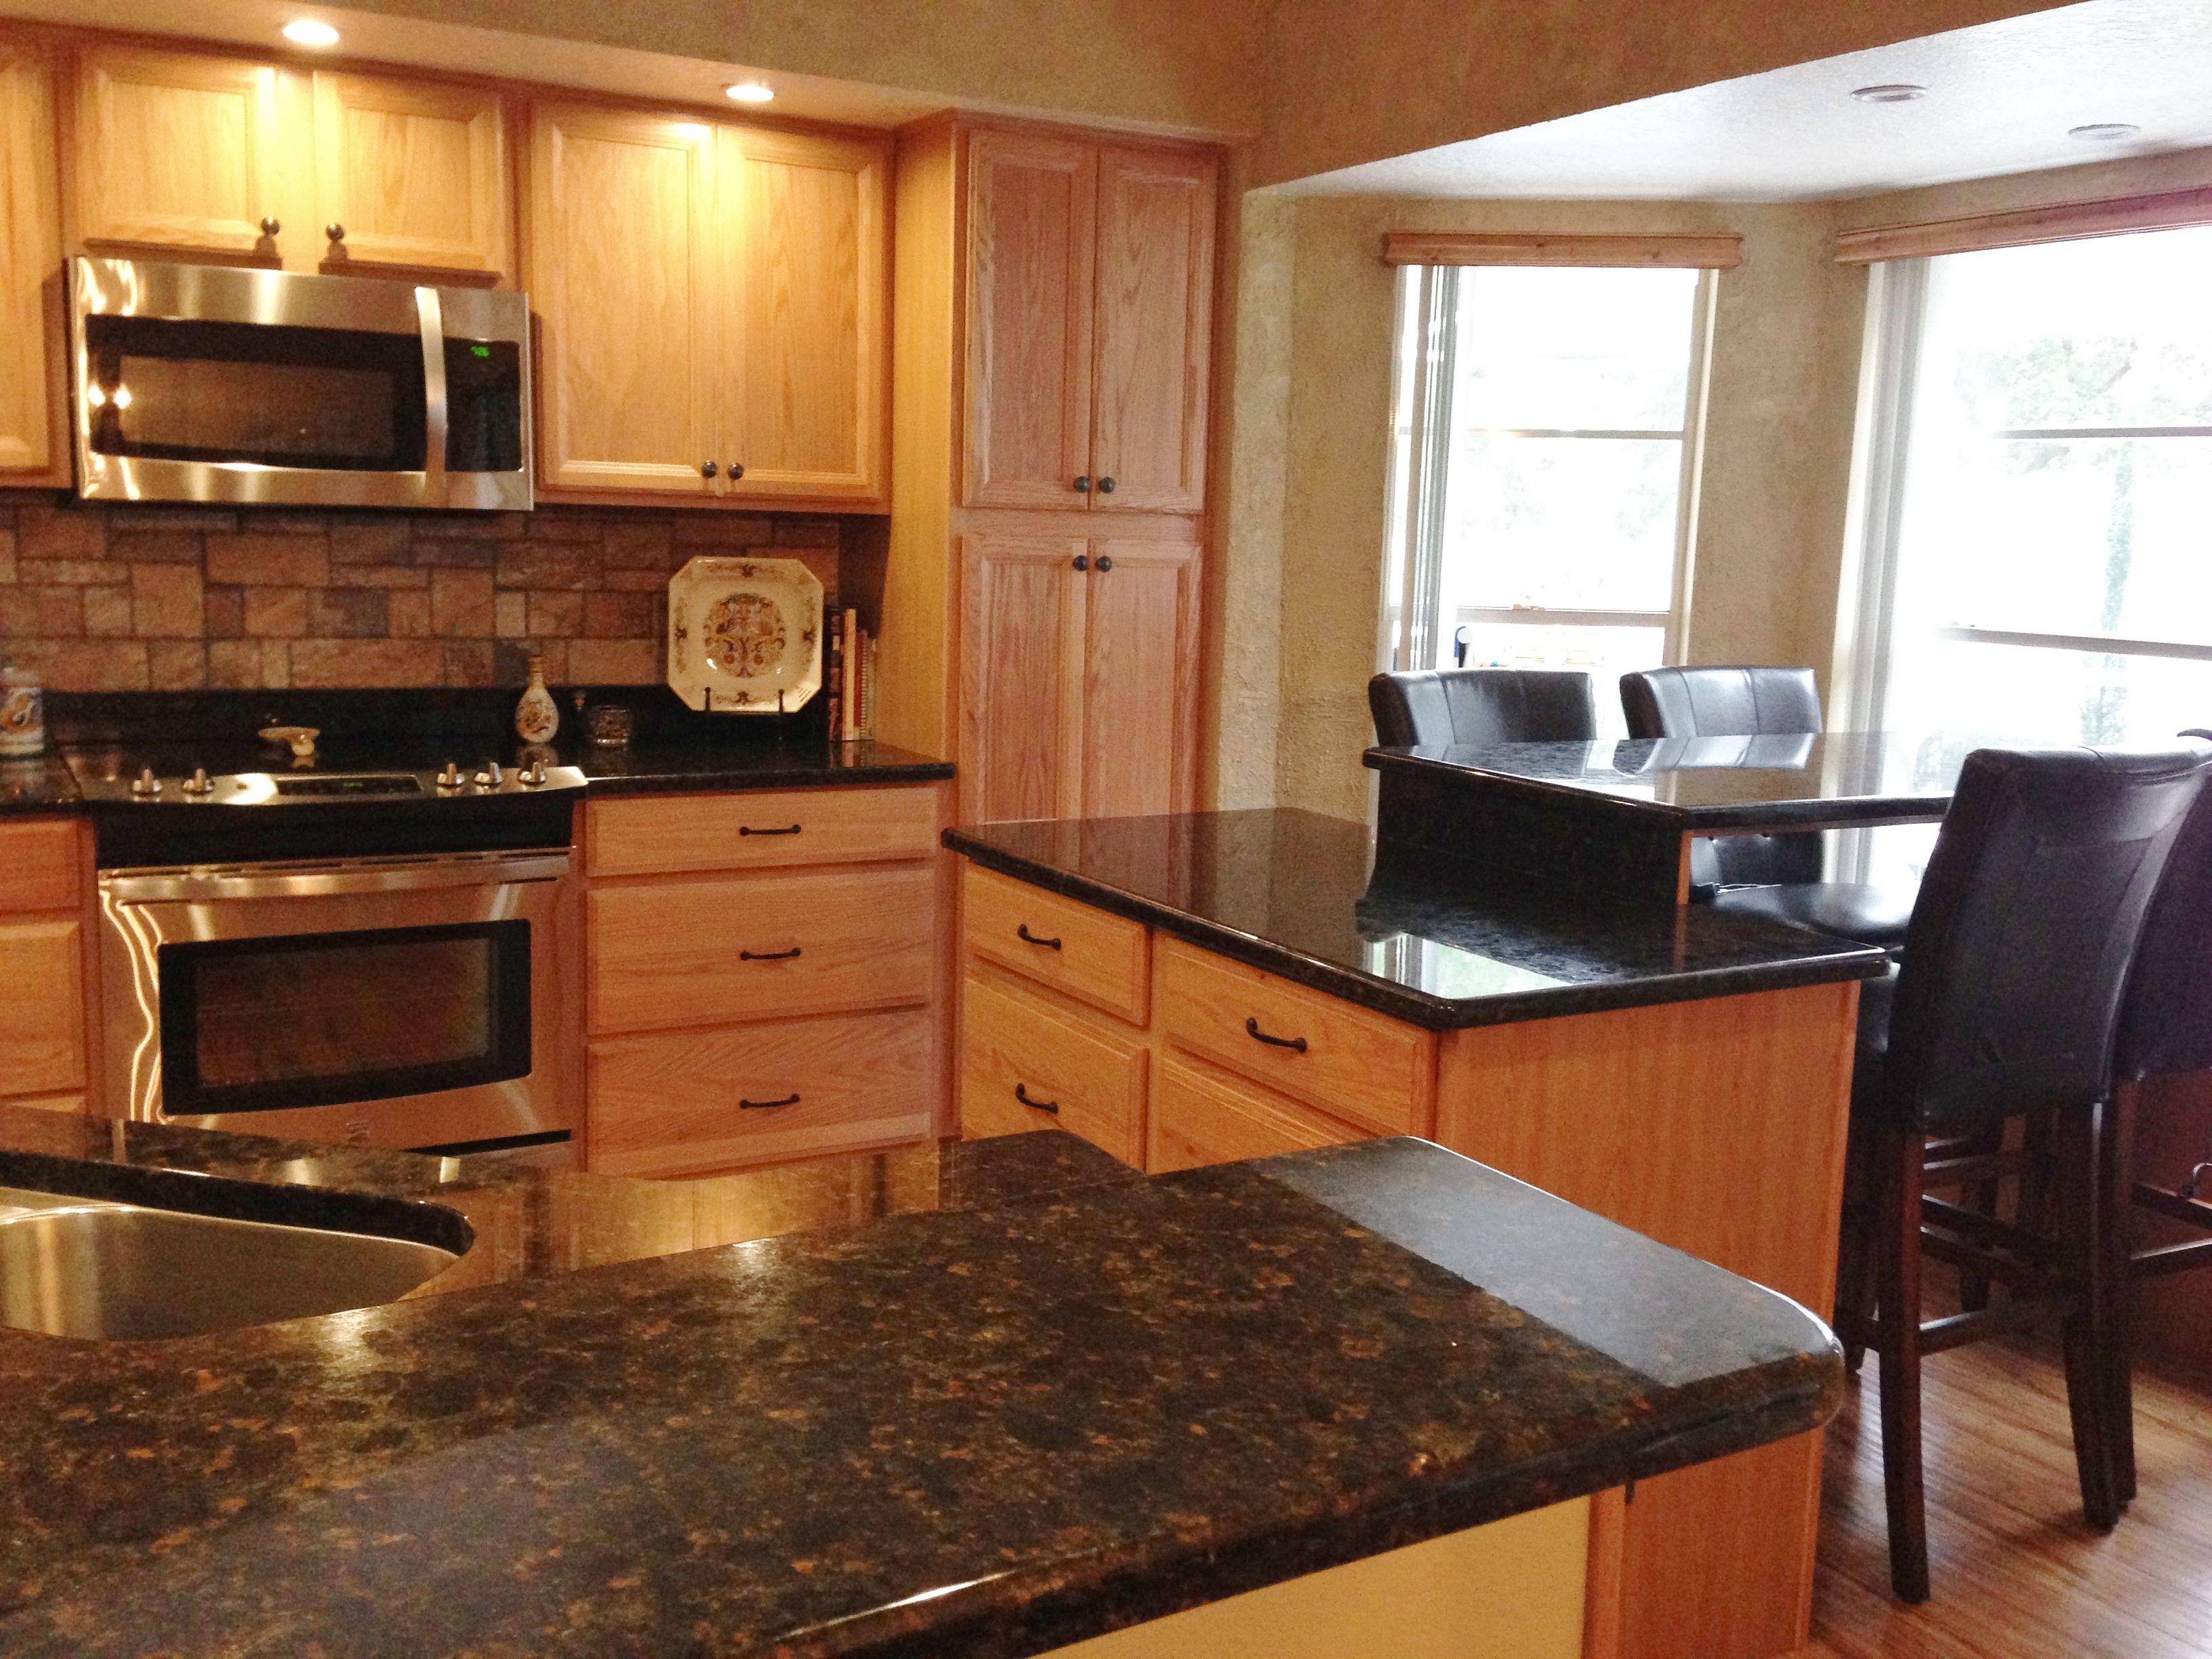 Kitchen remodel. American Woodmark soft close cabinets via Home ...